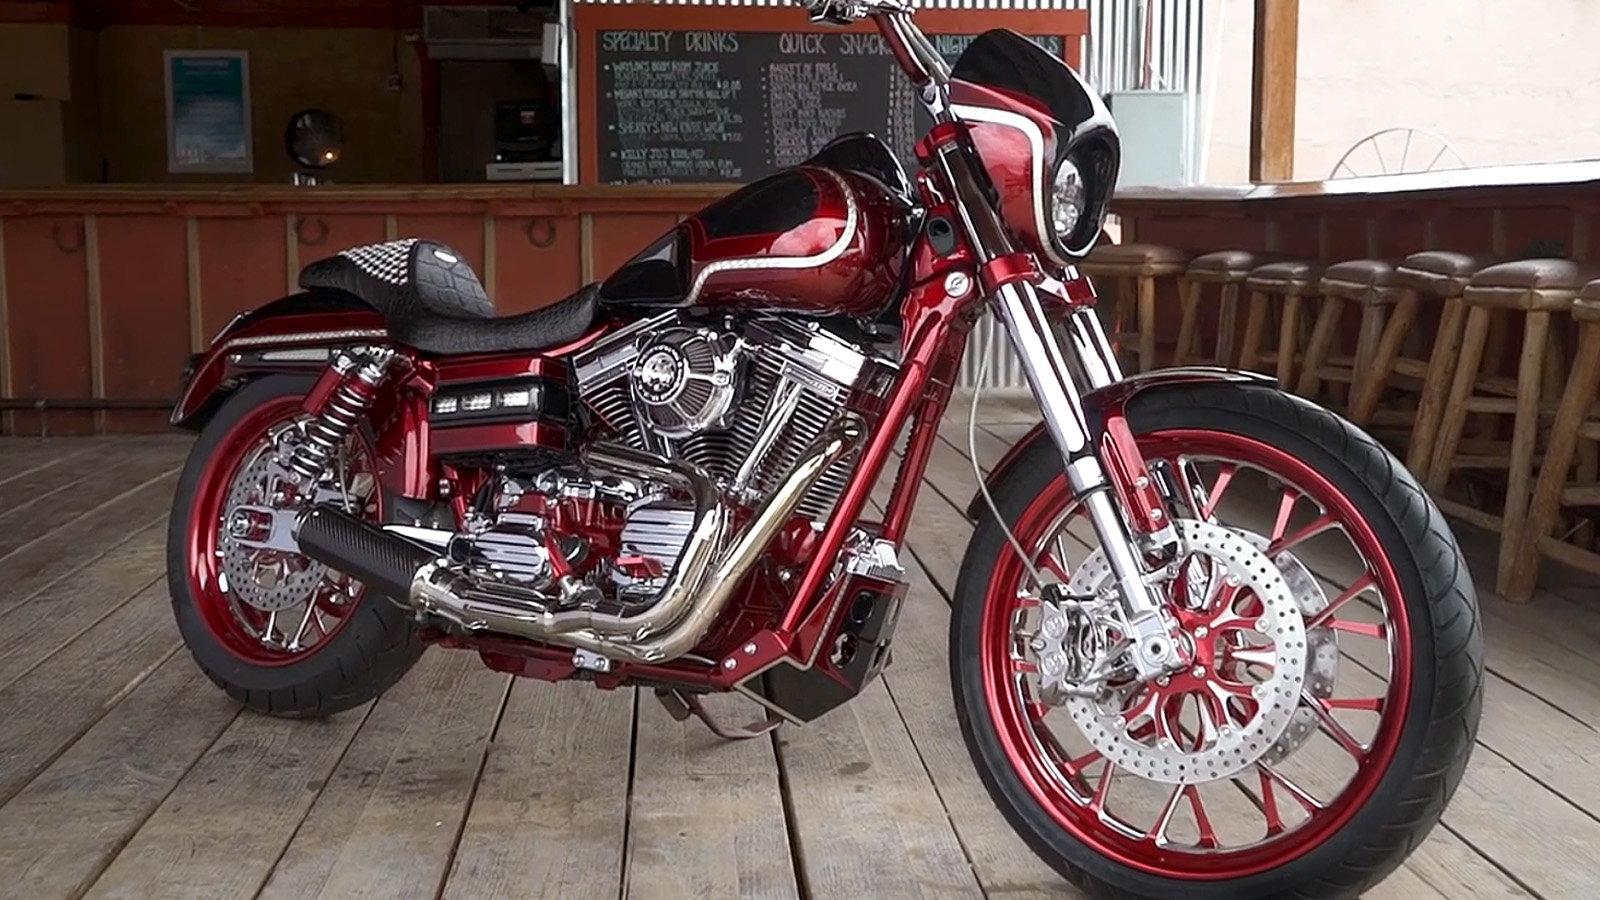 2017 Harley-Davidson Dyna Low Rider S Custom Build